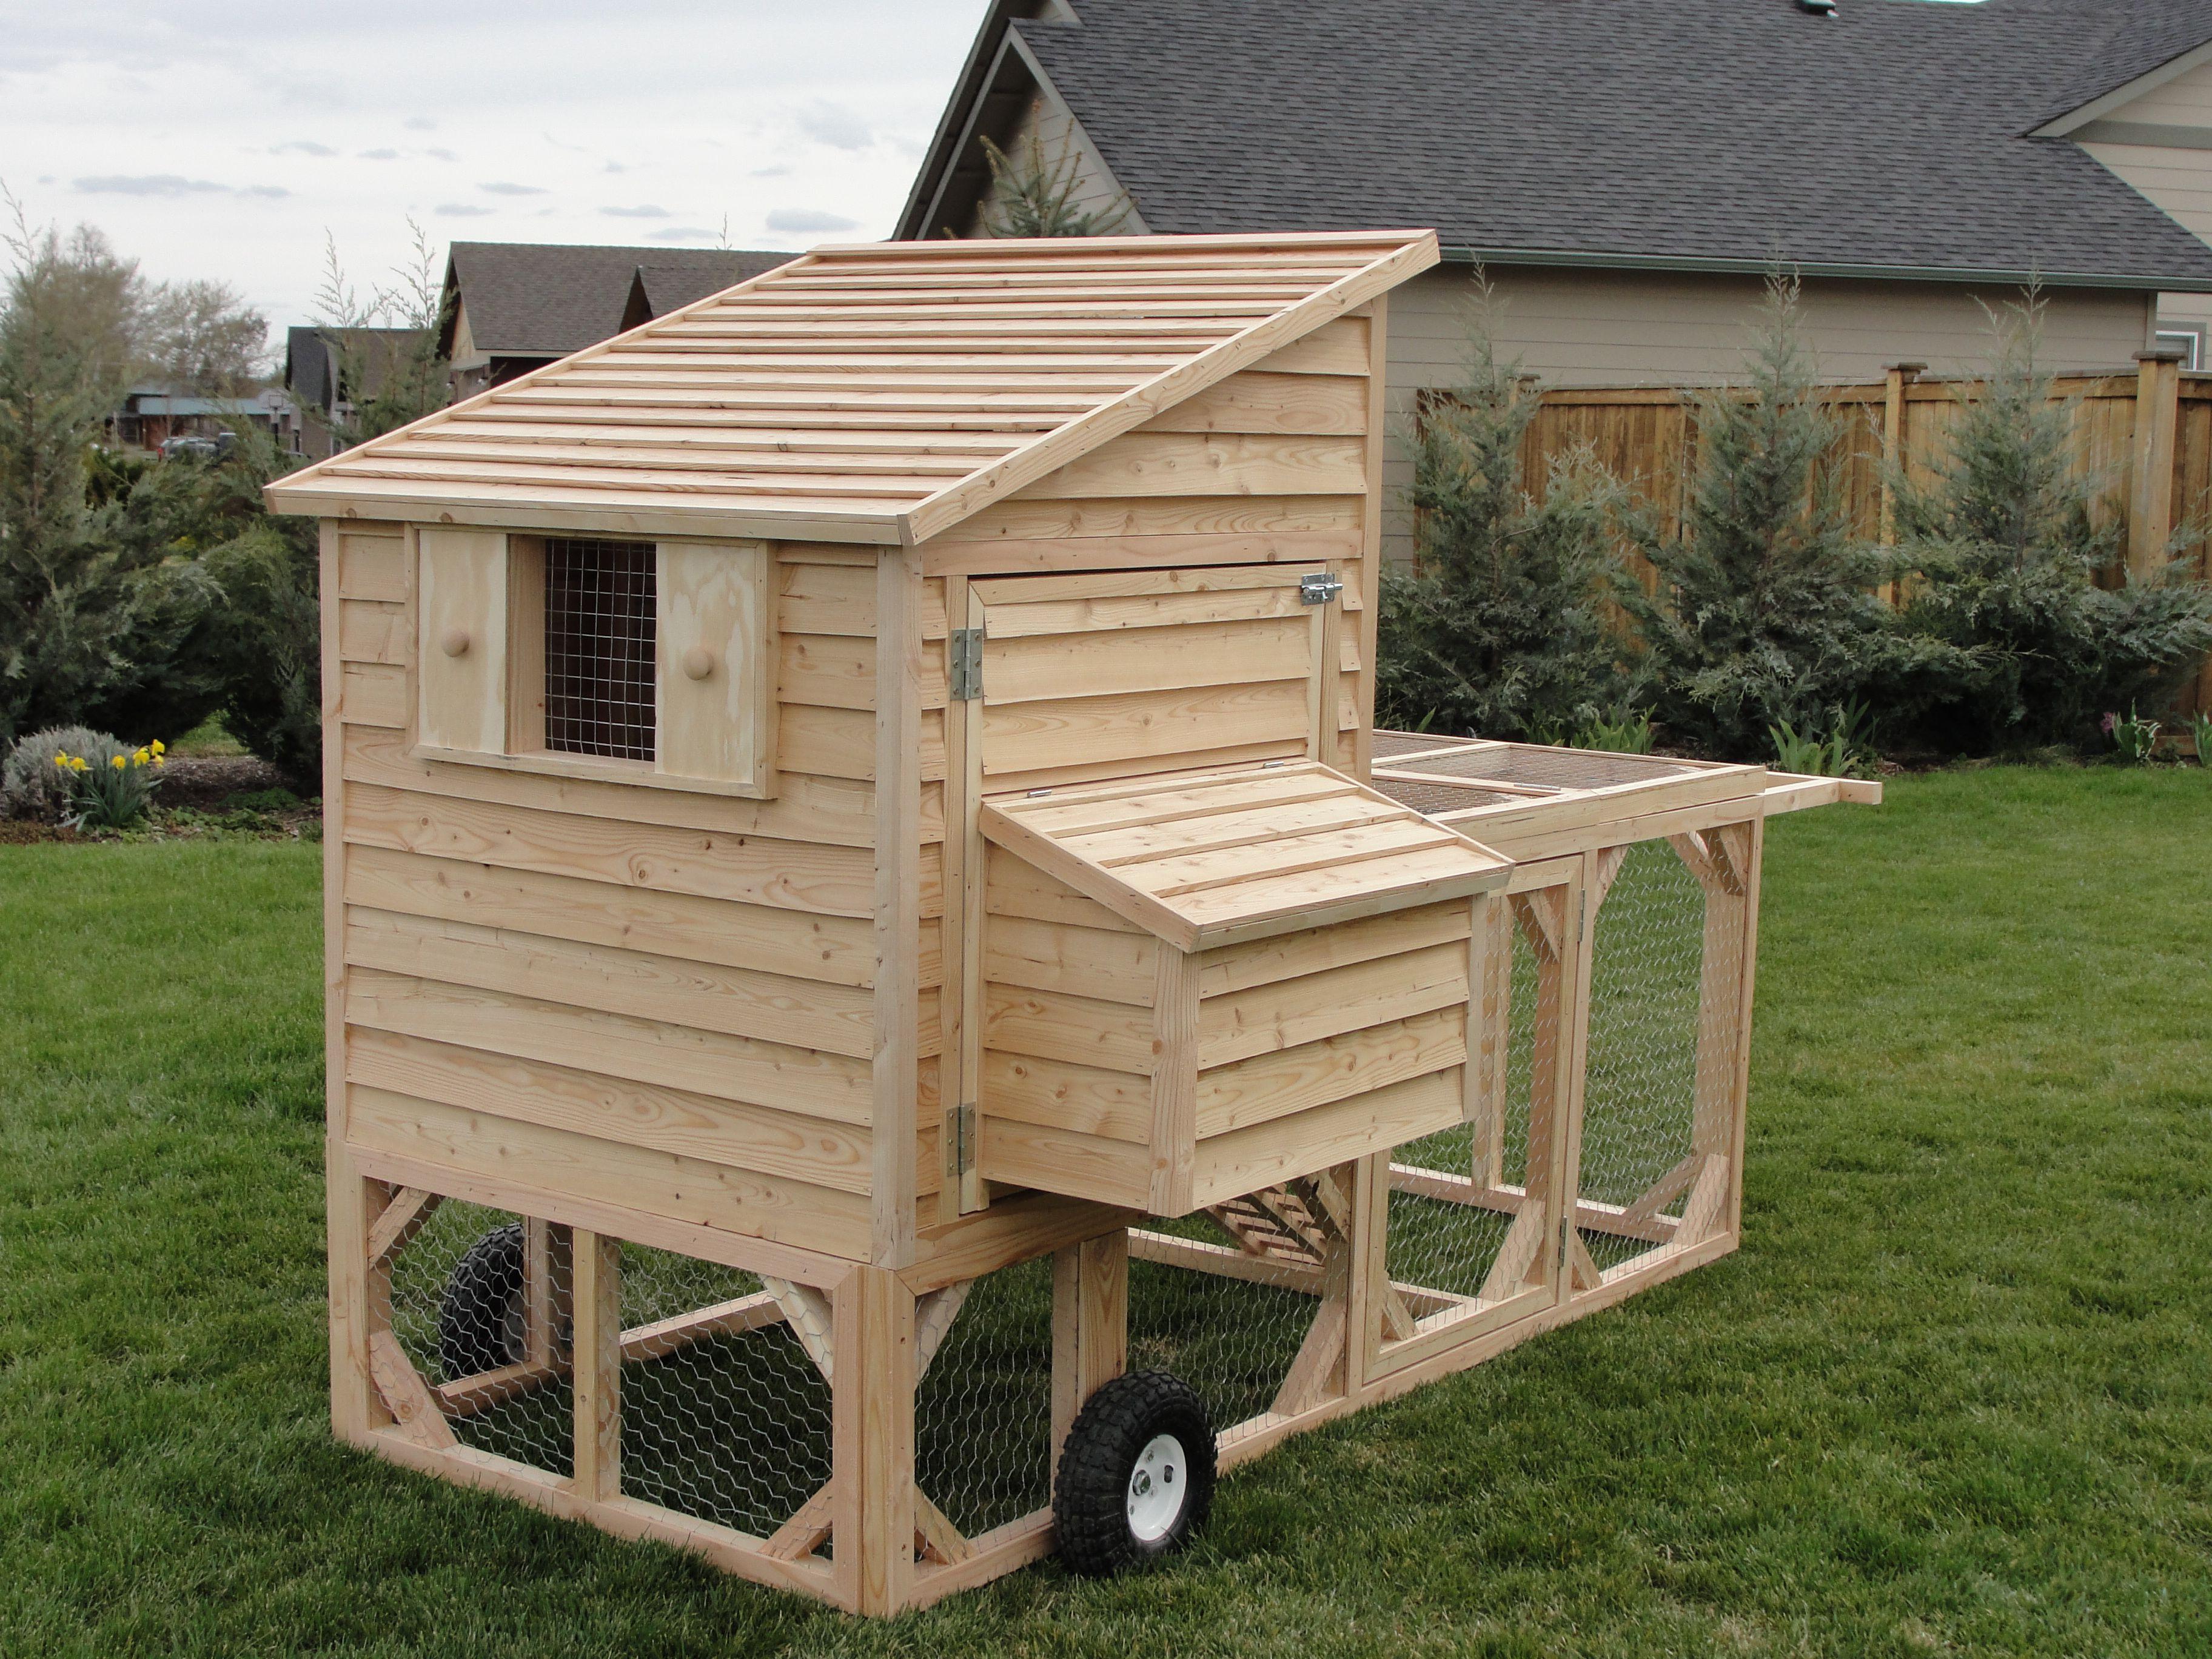 Chicken tractor co chicken coops farm animals for Portable chicken yard